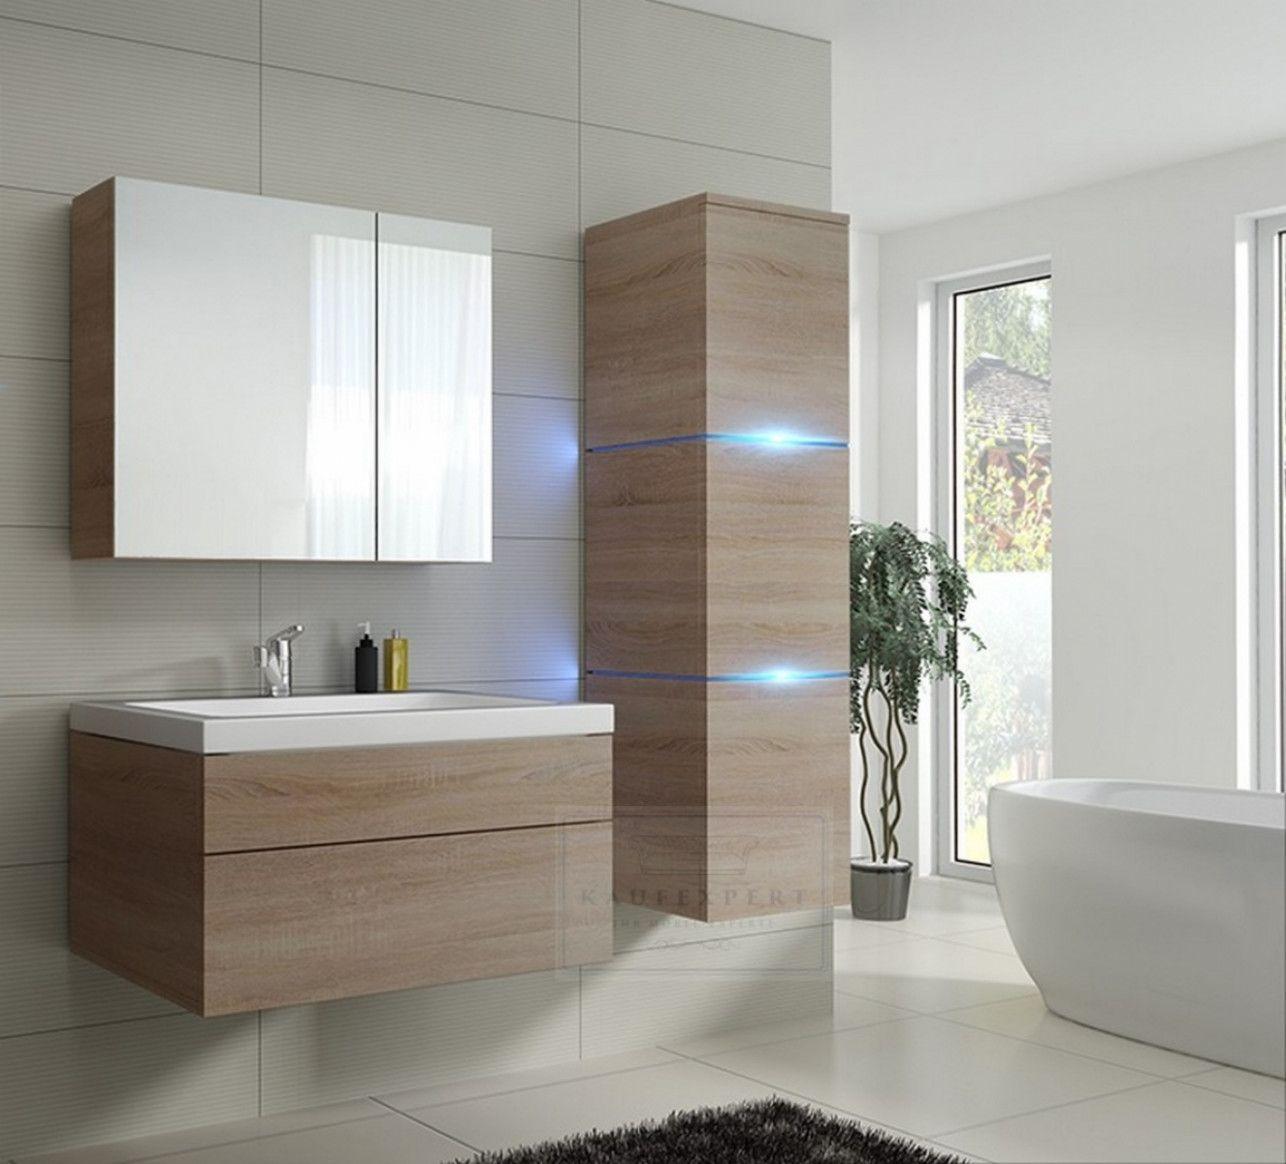 14 Mobel Mobel Eiche In 2020 Badezimmer Mobel Holzoptik Badezimmer Zubehor Set